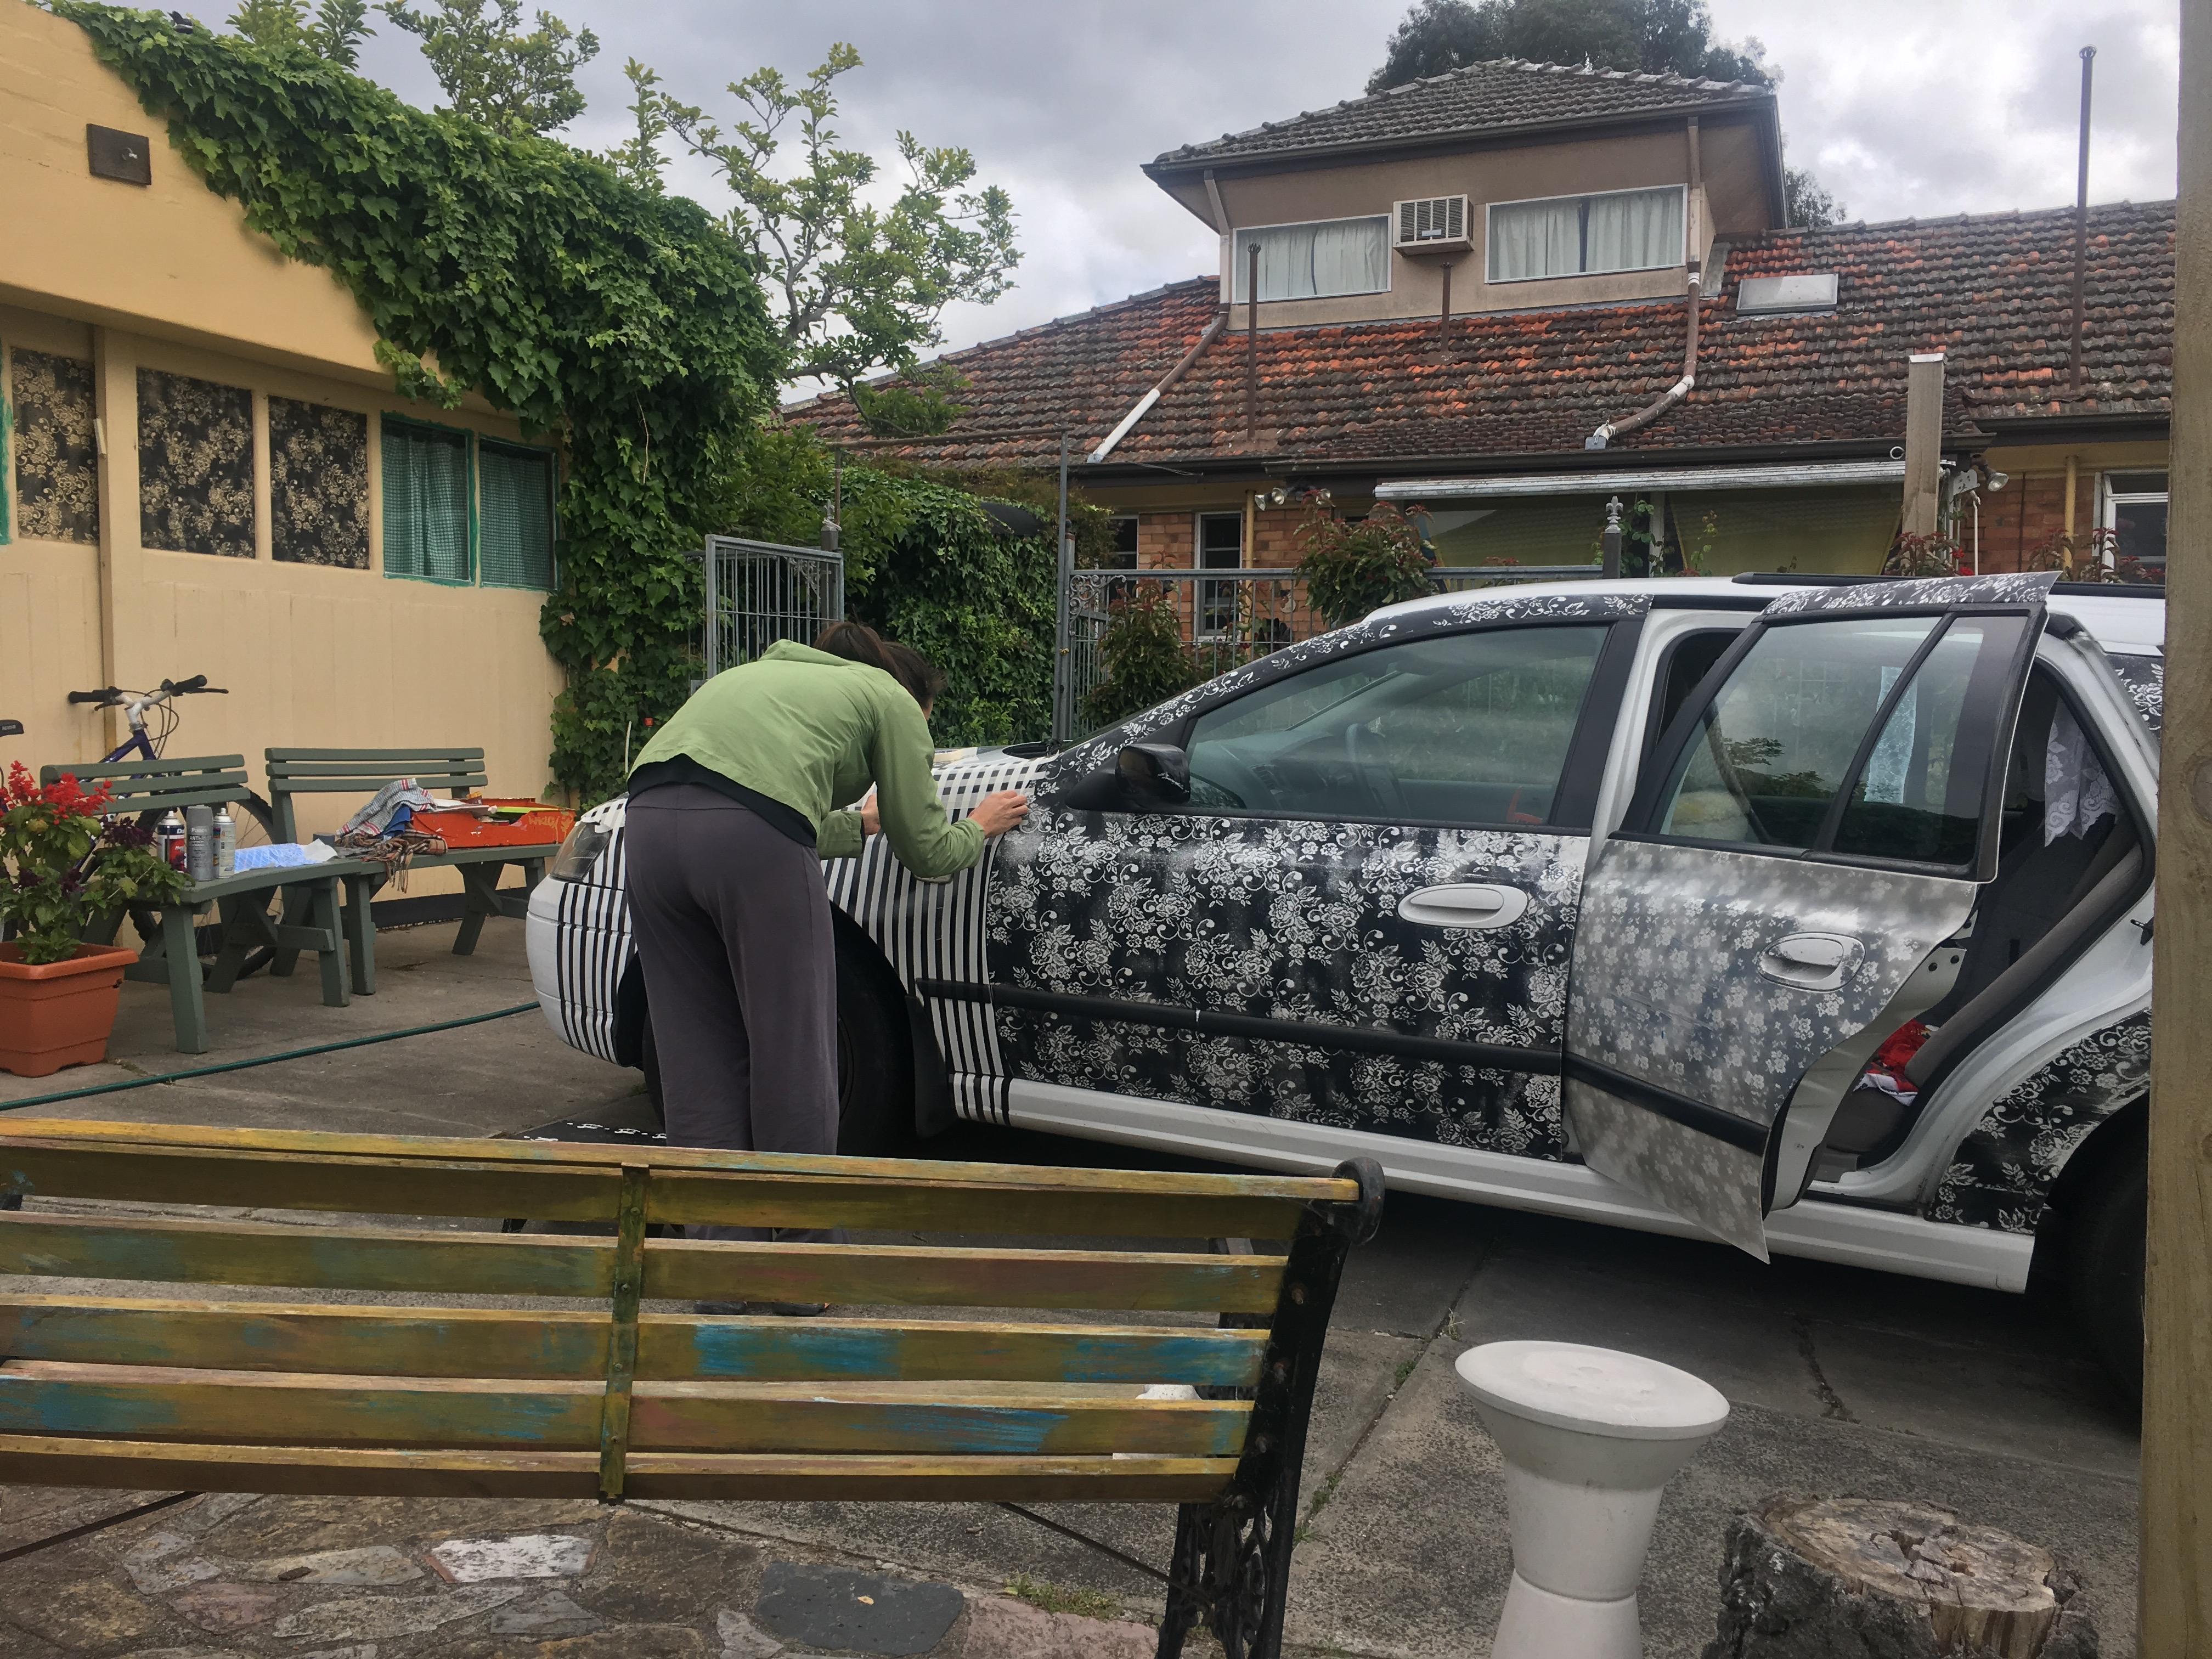 2018. Sandra helping spray the car